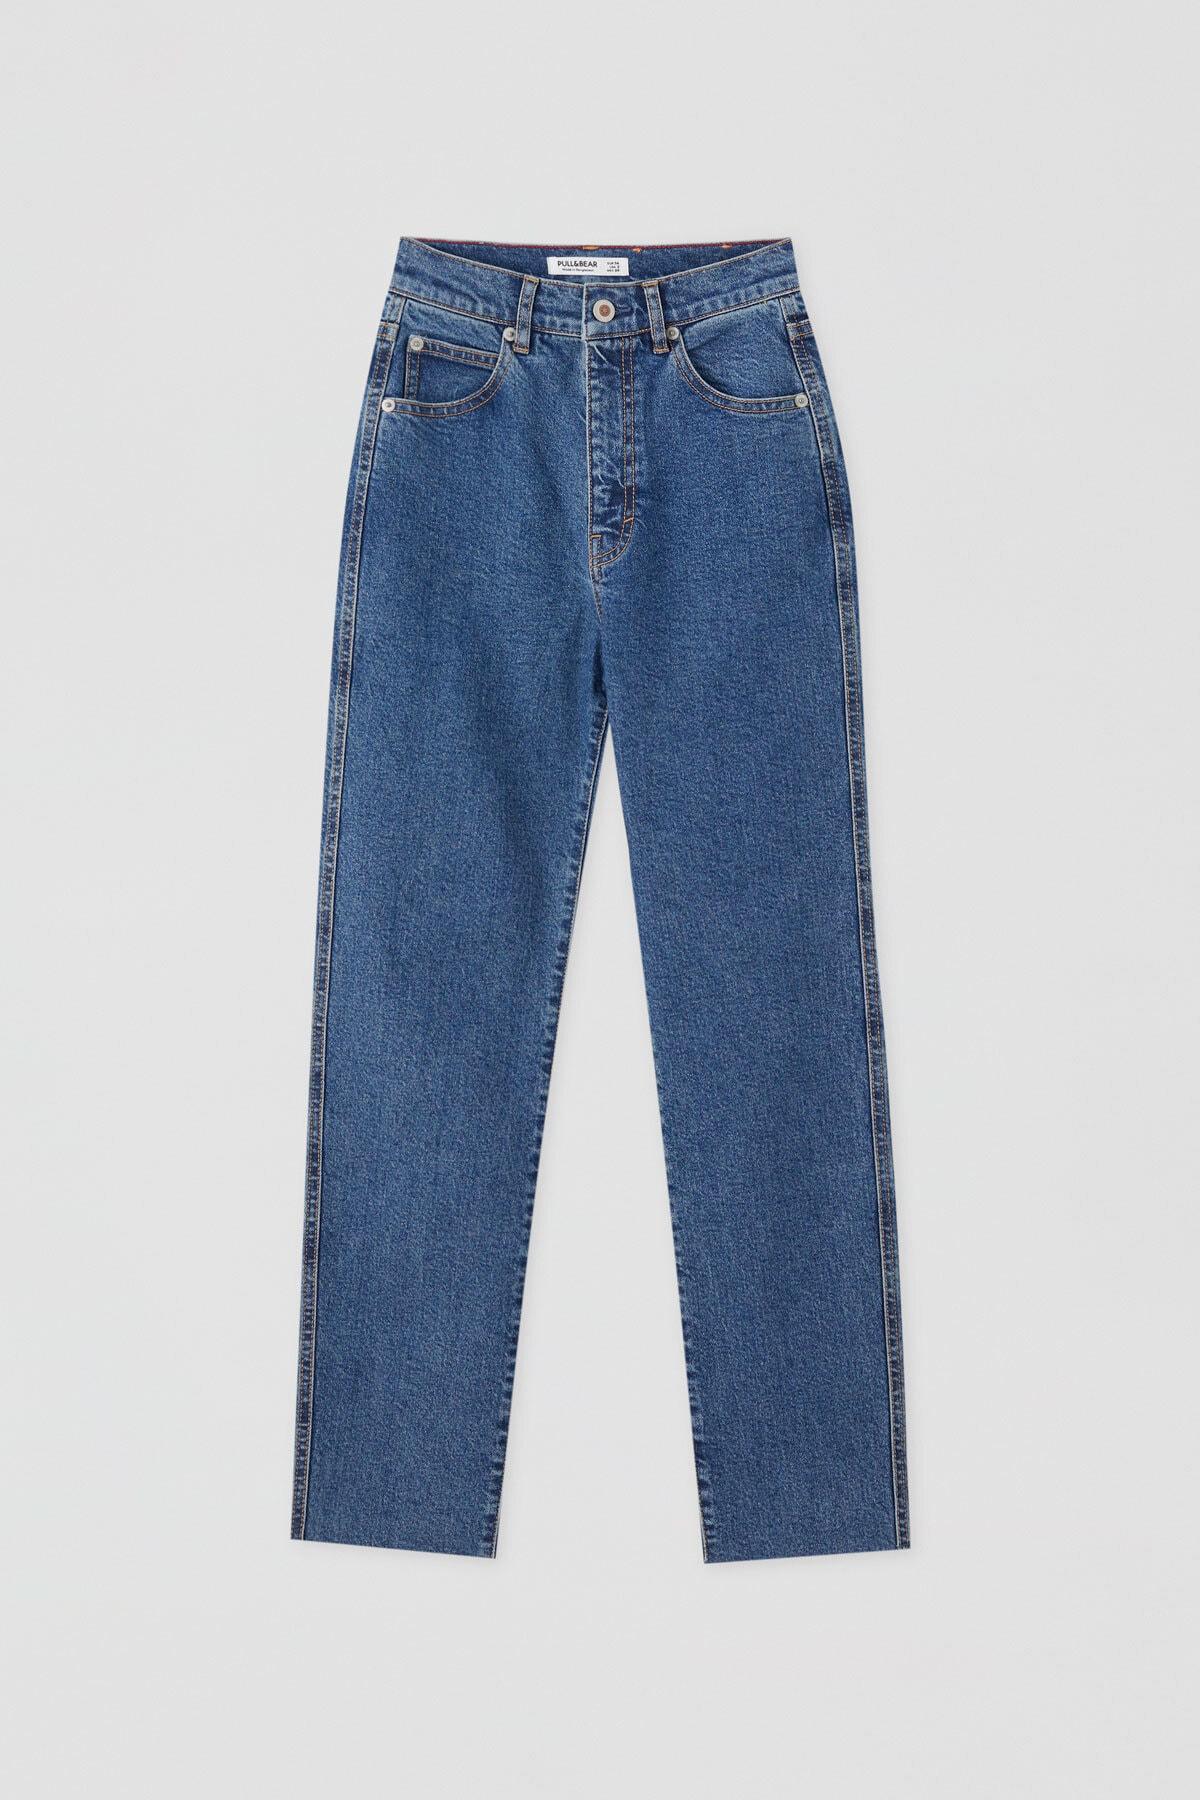 Pull & Bear Kadın Mavi Comfort Slim Fit Mom Jean 05682305 4